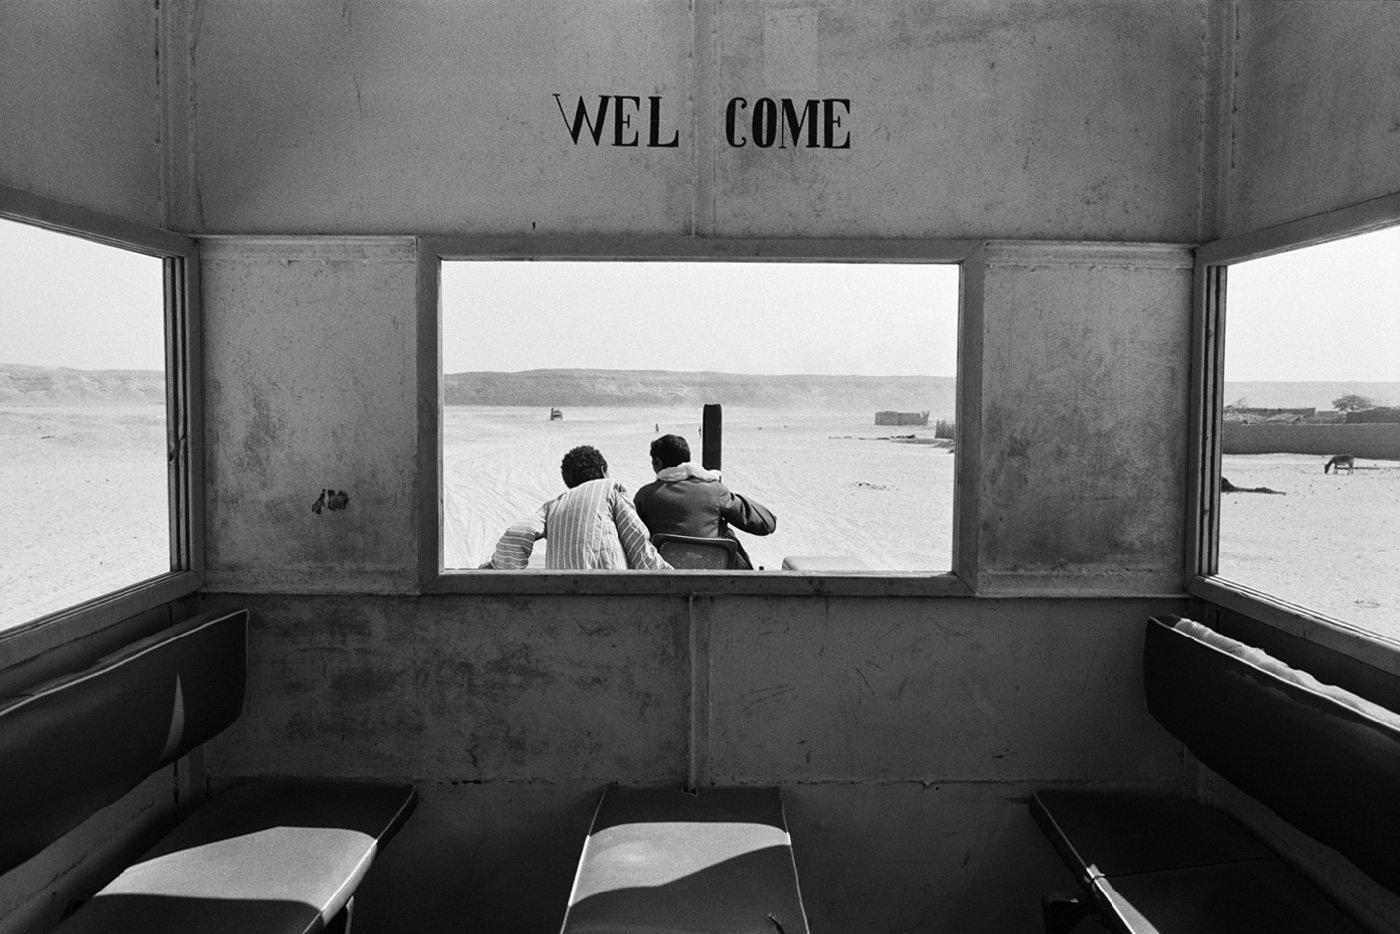 denis-roche 25 mars 1981. Tell-El-Amarna, Égypte